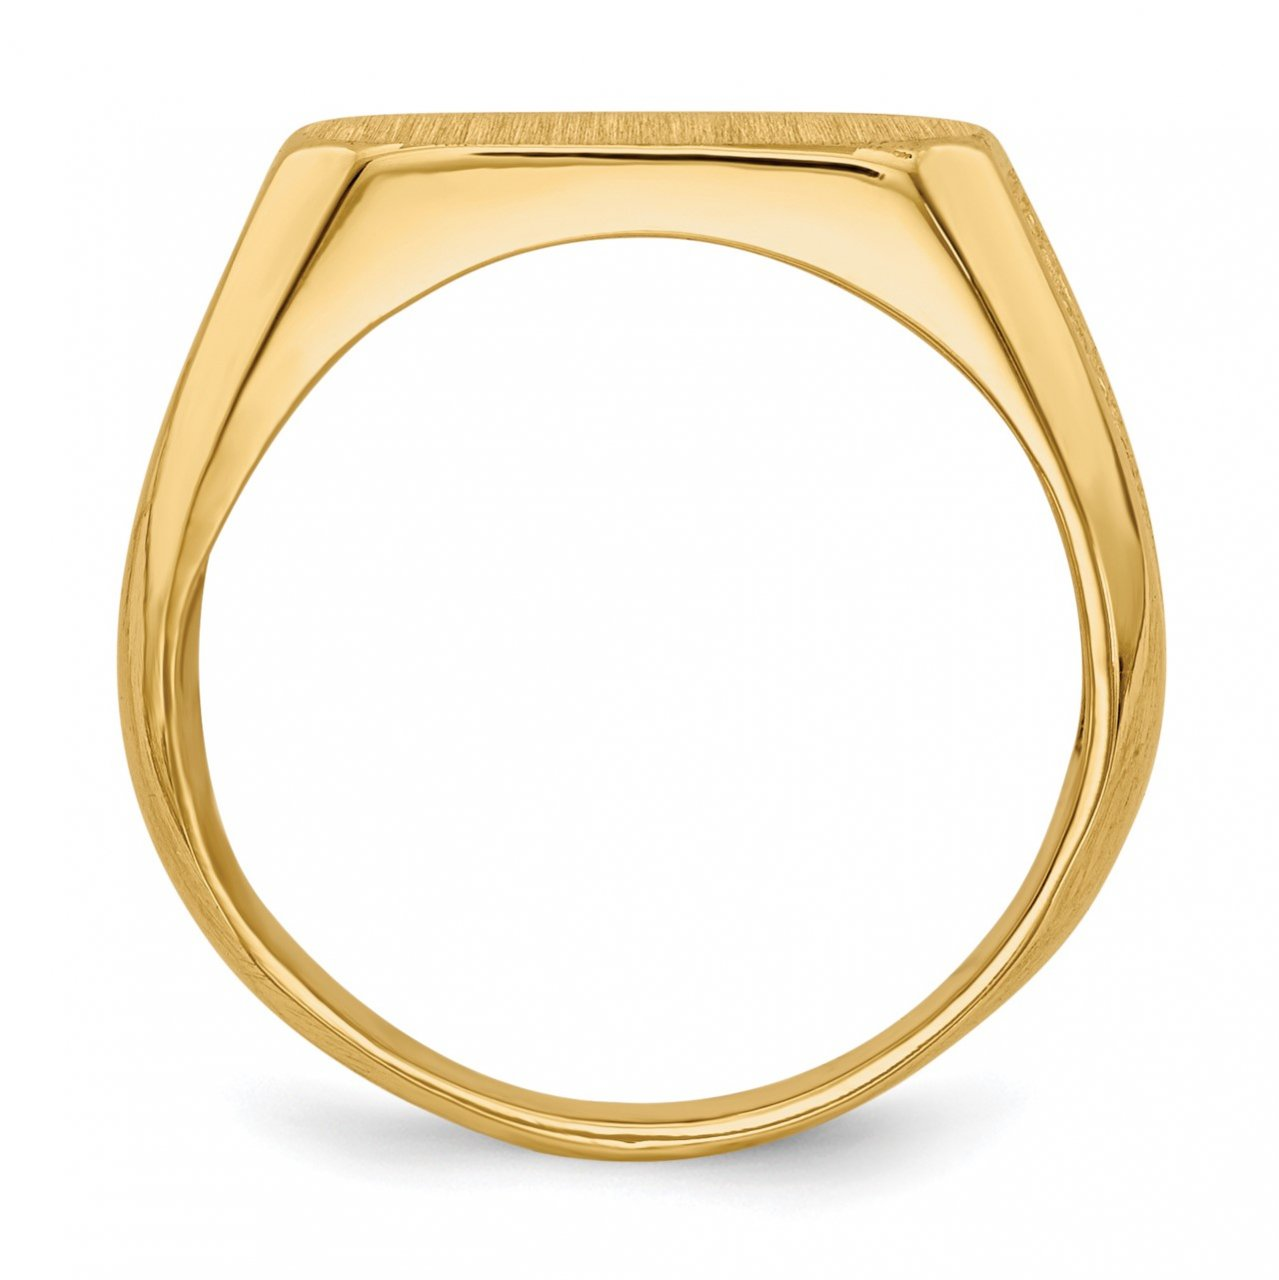 14k 6.0x12.5mm Closed Back Signet Ring-1